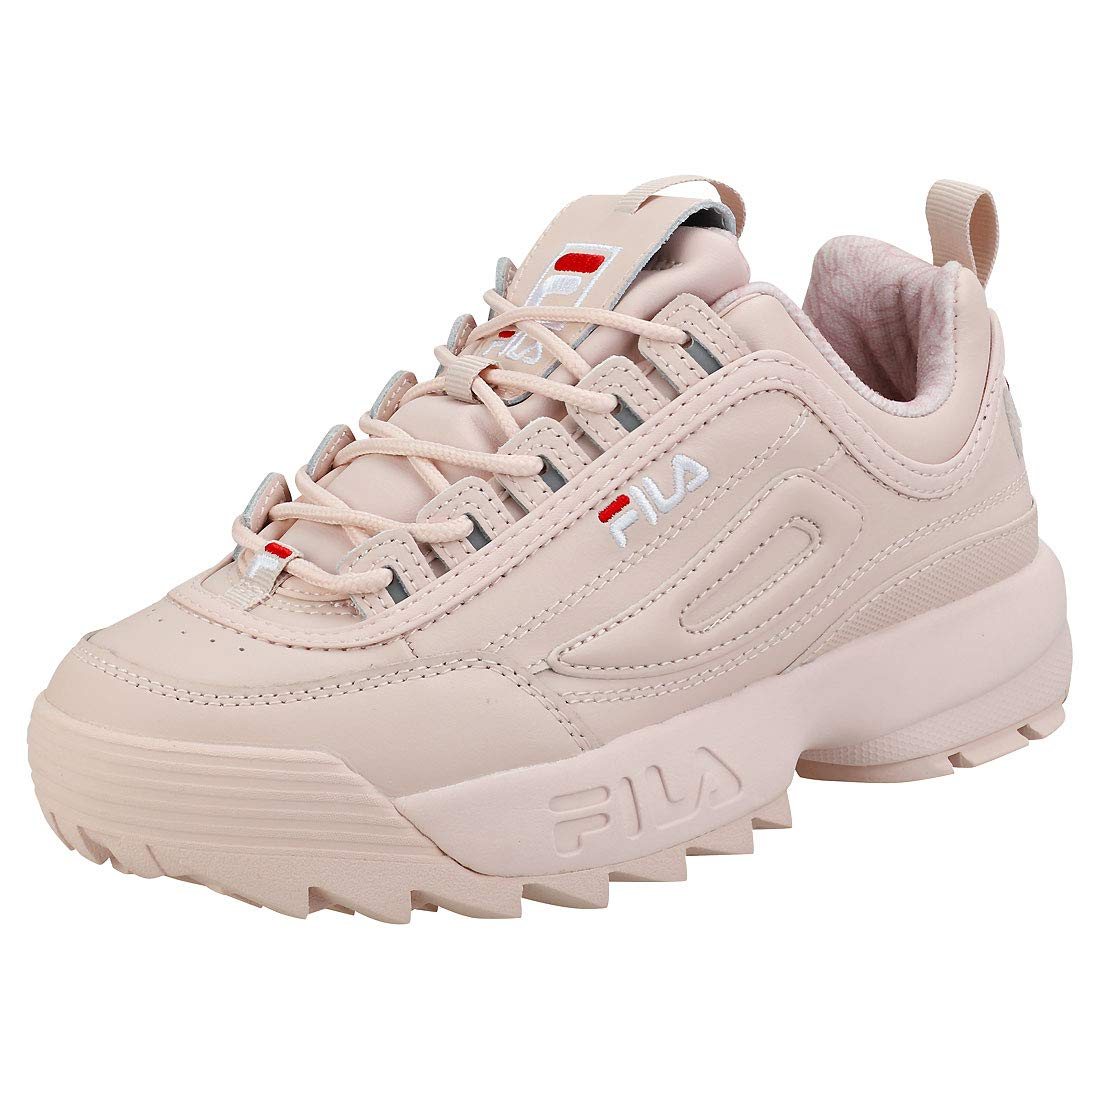 Peach bluesh White Fila Red Fila Womens White Disruptor II Premium Sneakers